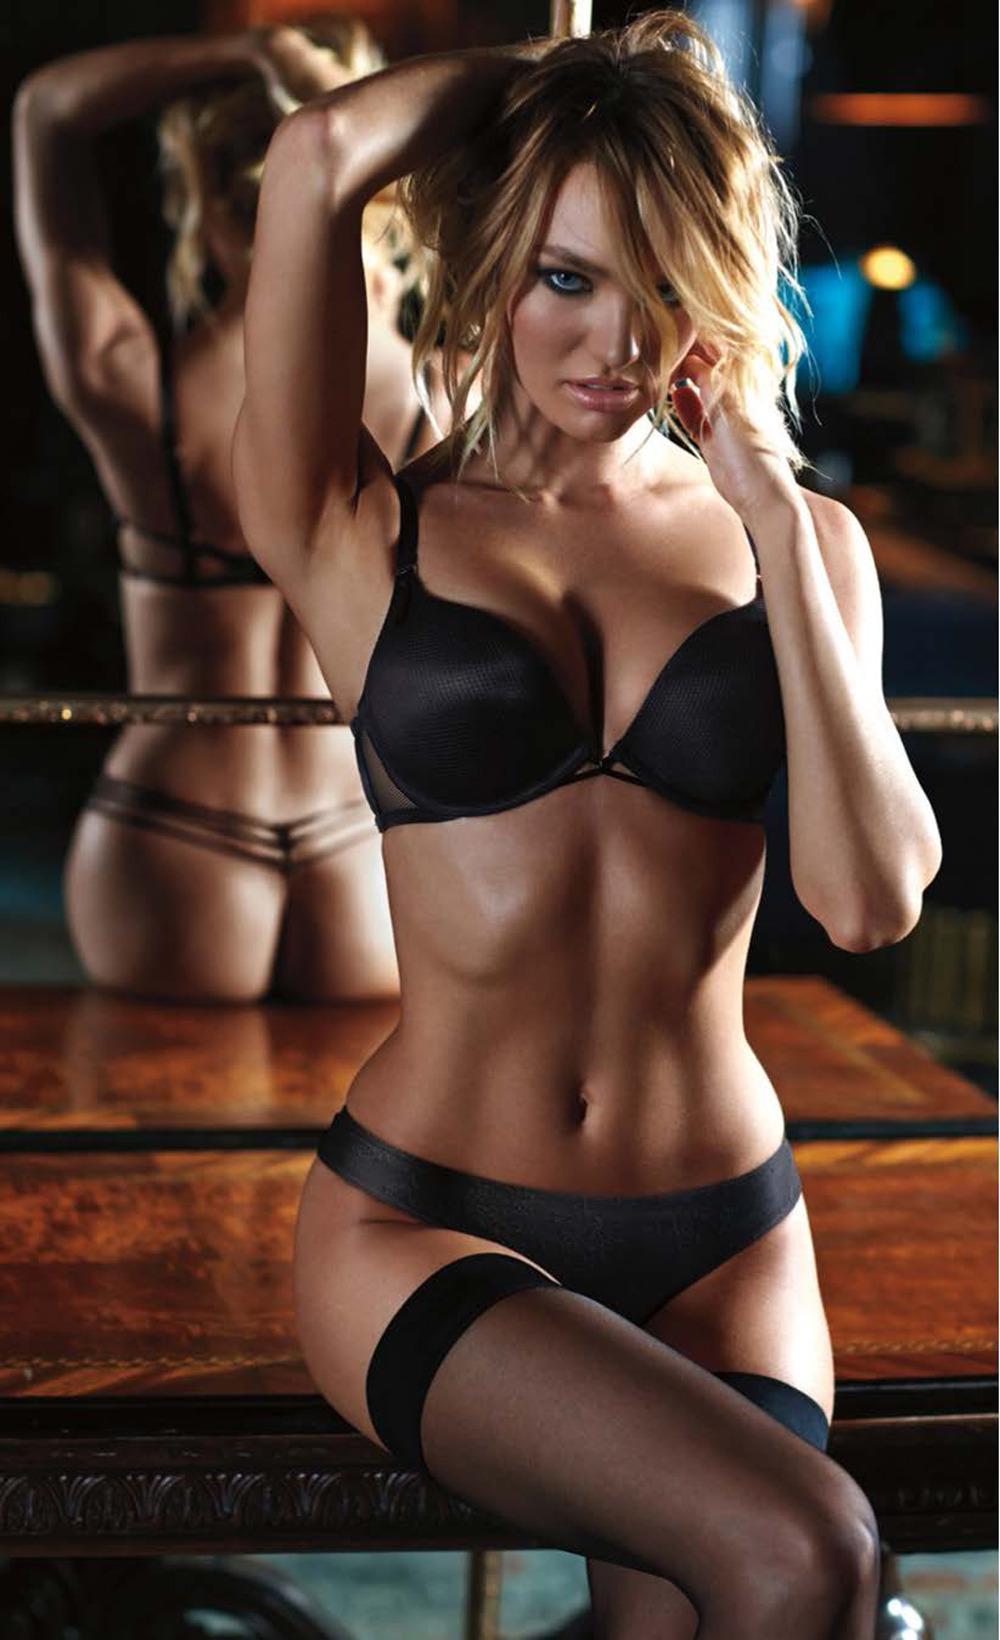 Beautiful girl brunette sexy fitness lingerie stock photo